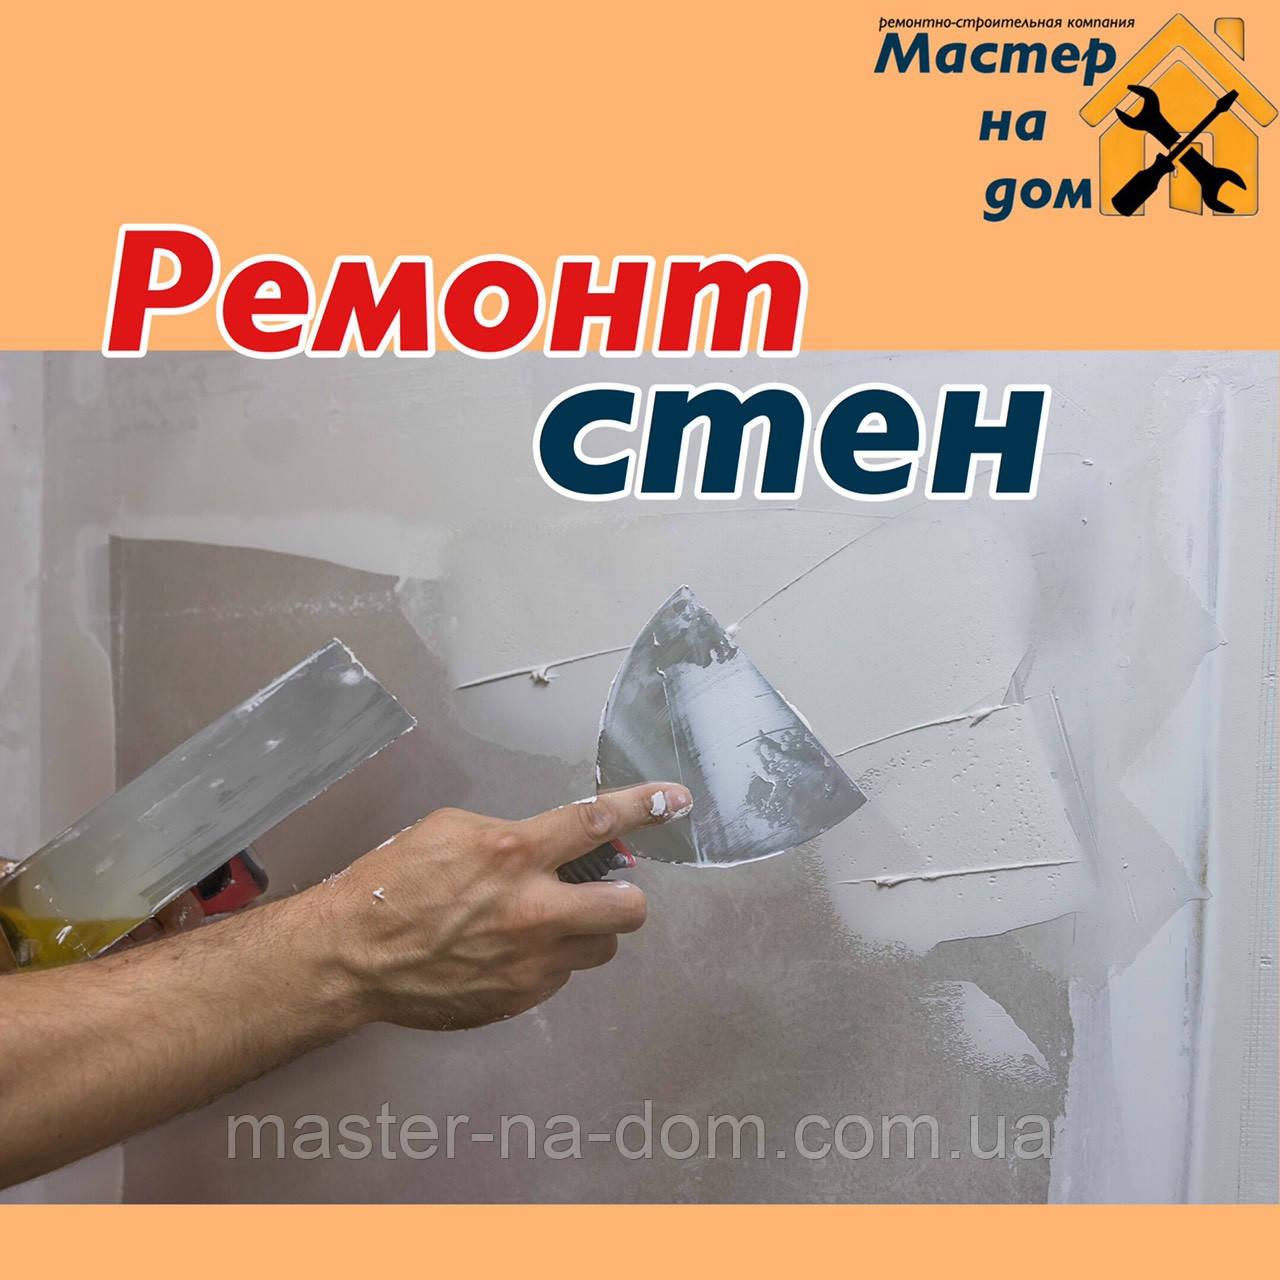 Ремонт стен в Харькове